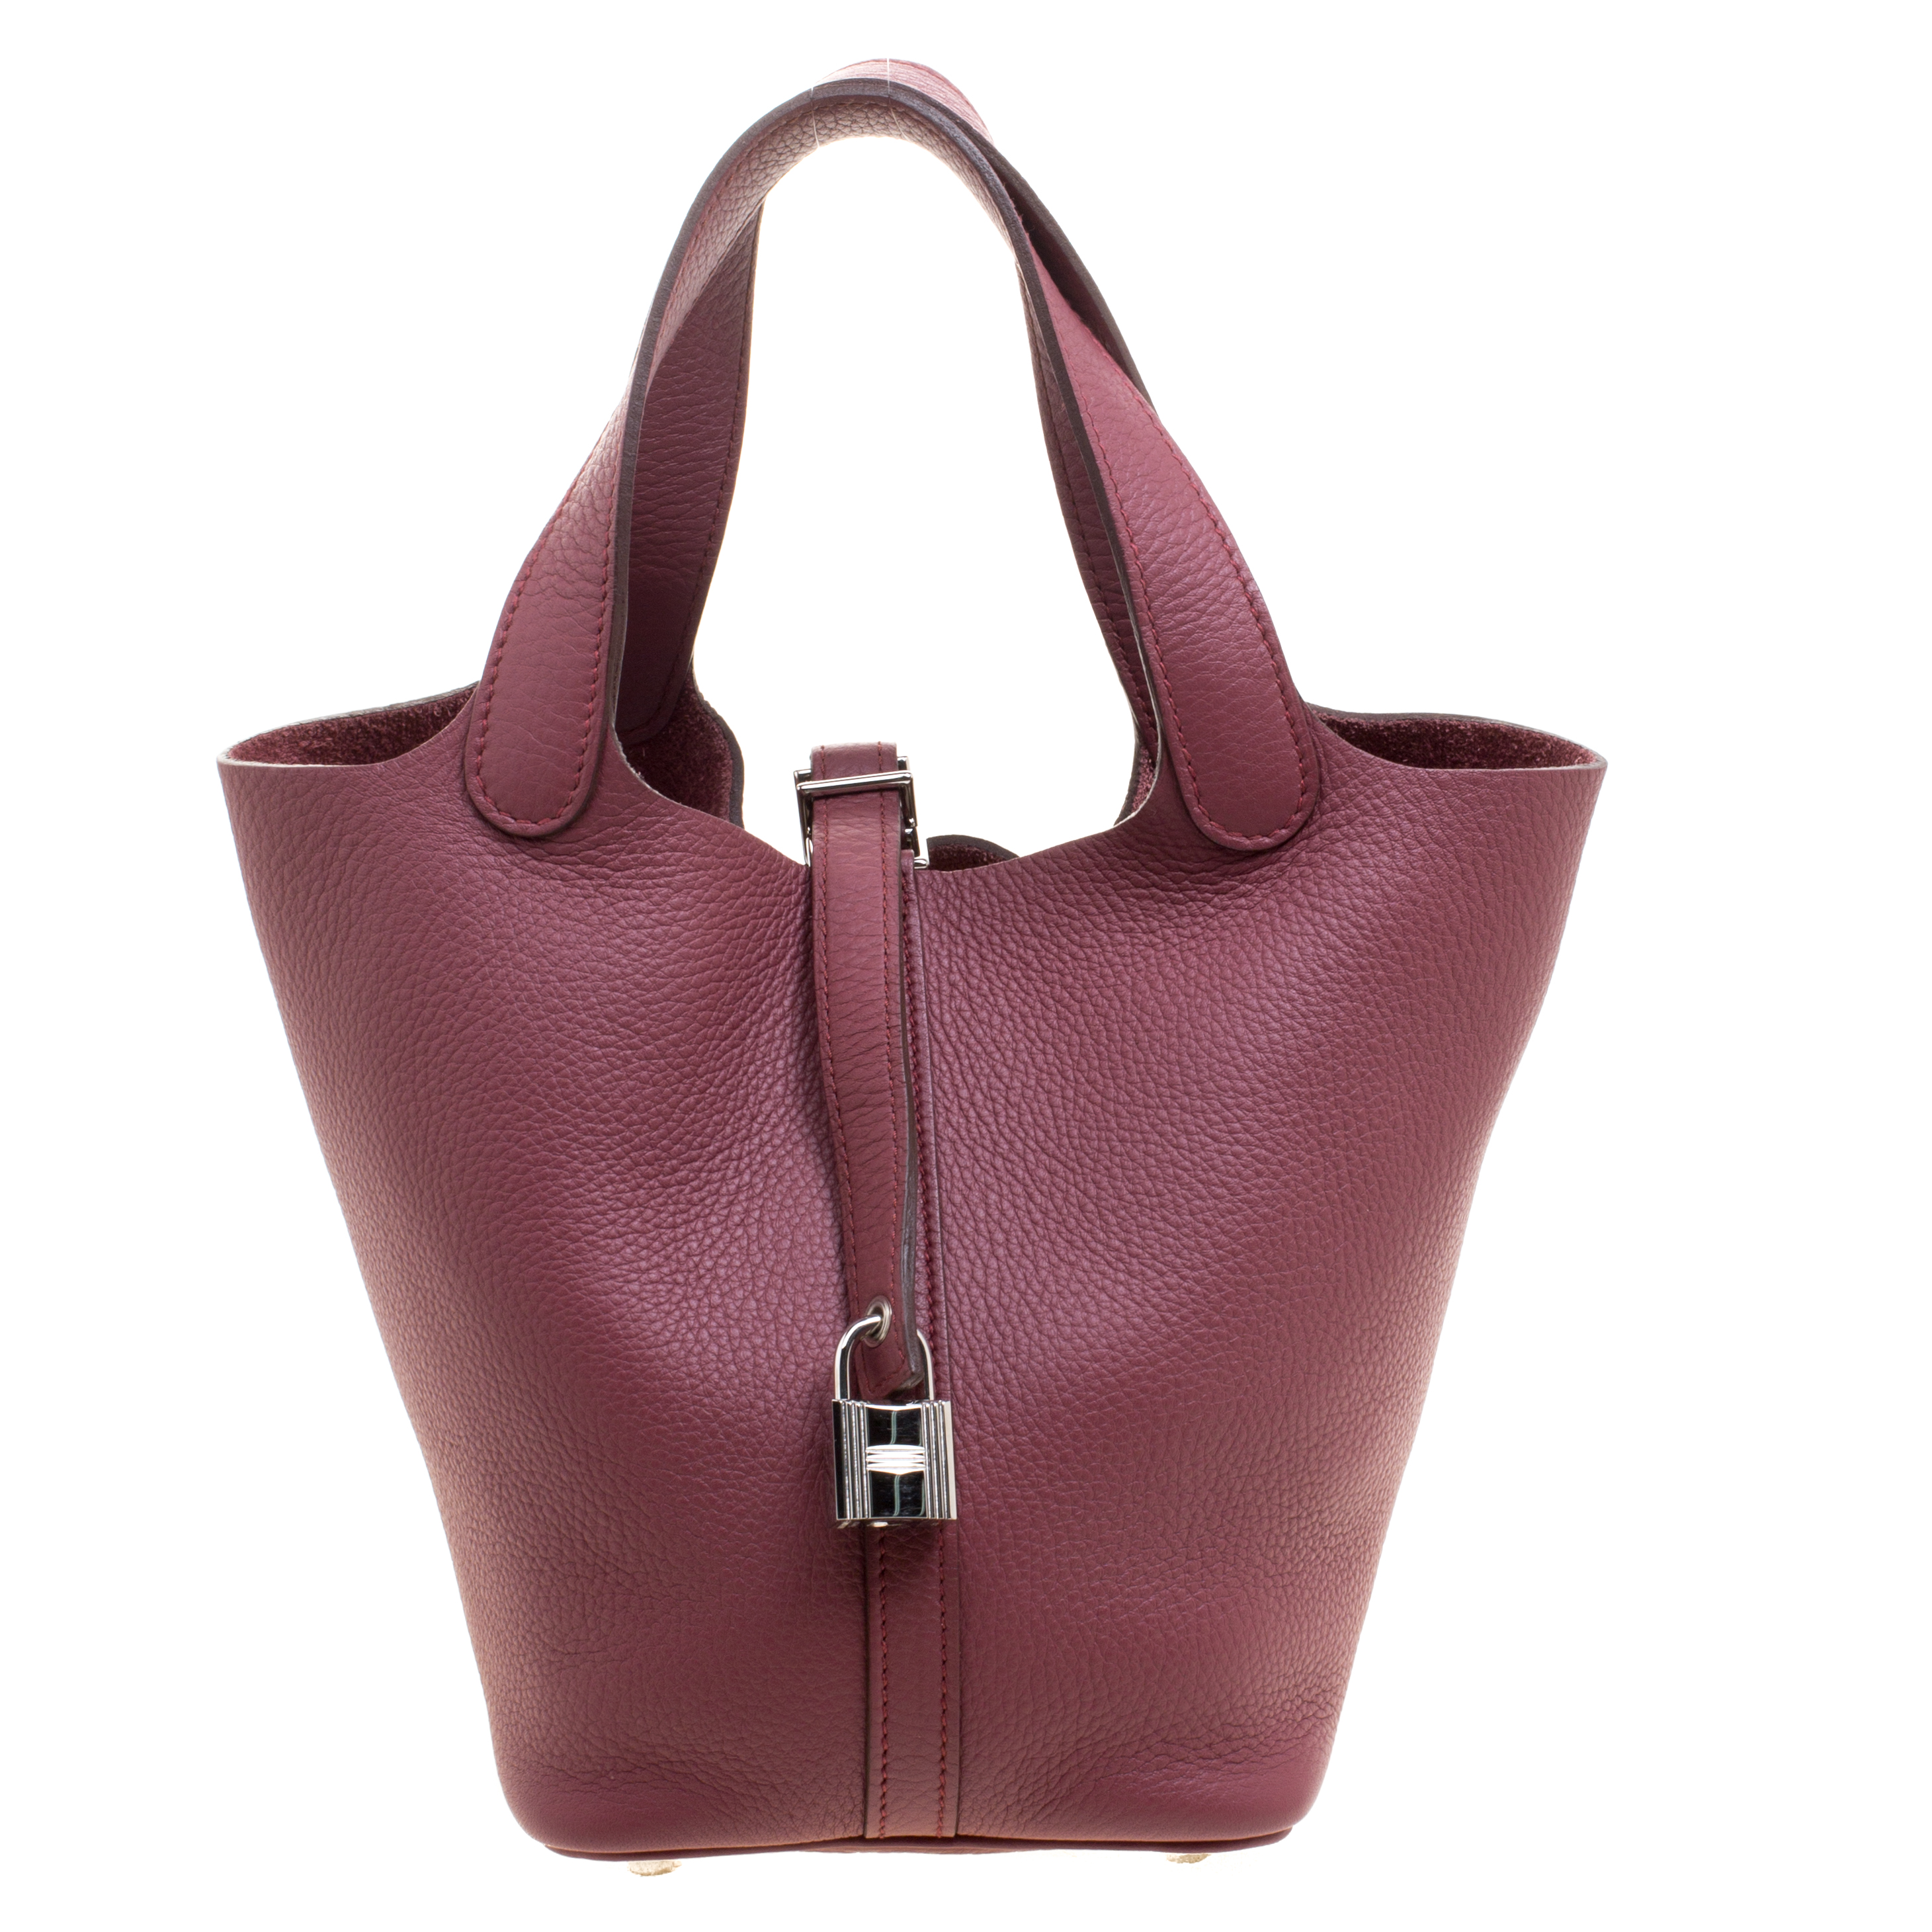 f6a9209d8 إشتري حقيبة هيرمس بيكوتين جلد كليمينس بوا دو روز PM 117963 بأفضل ...